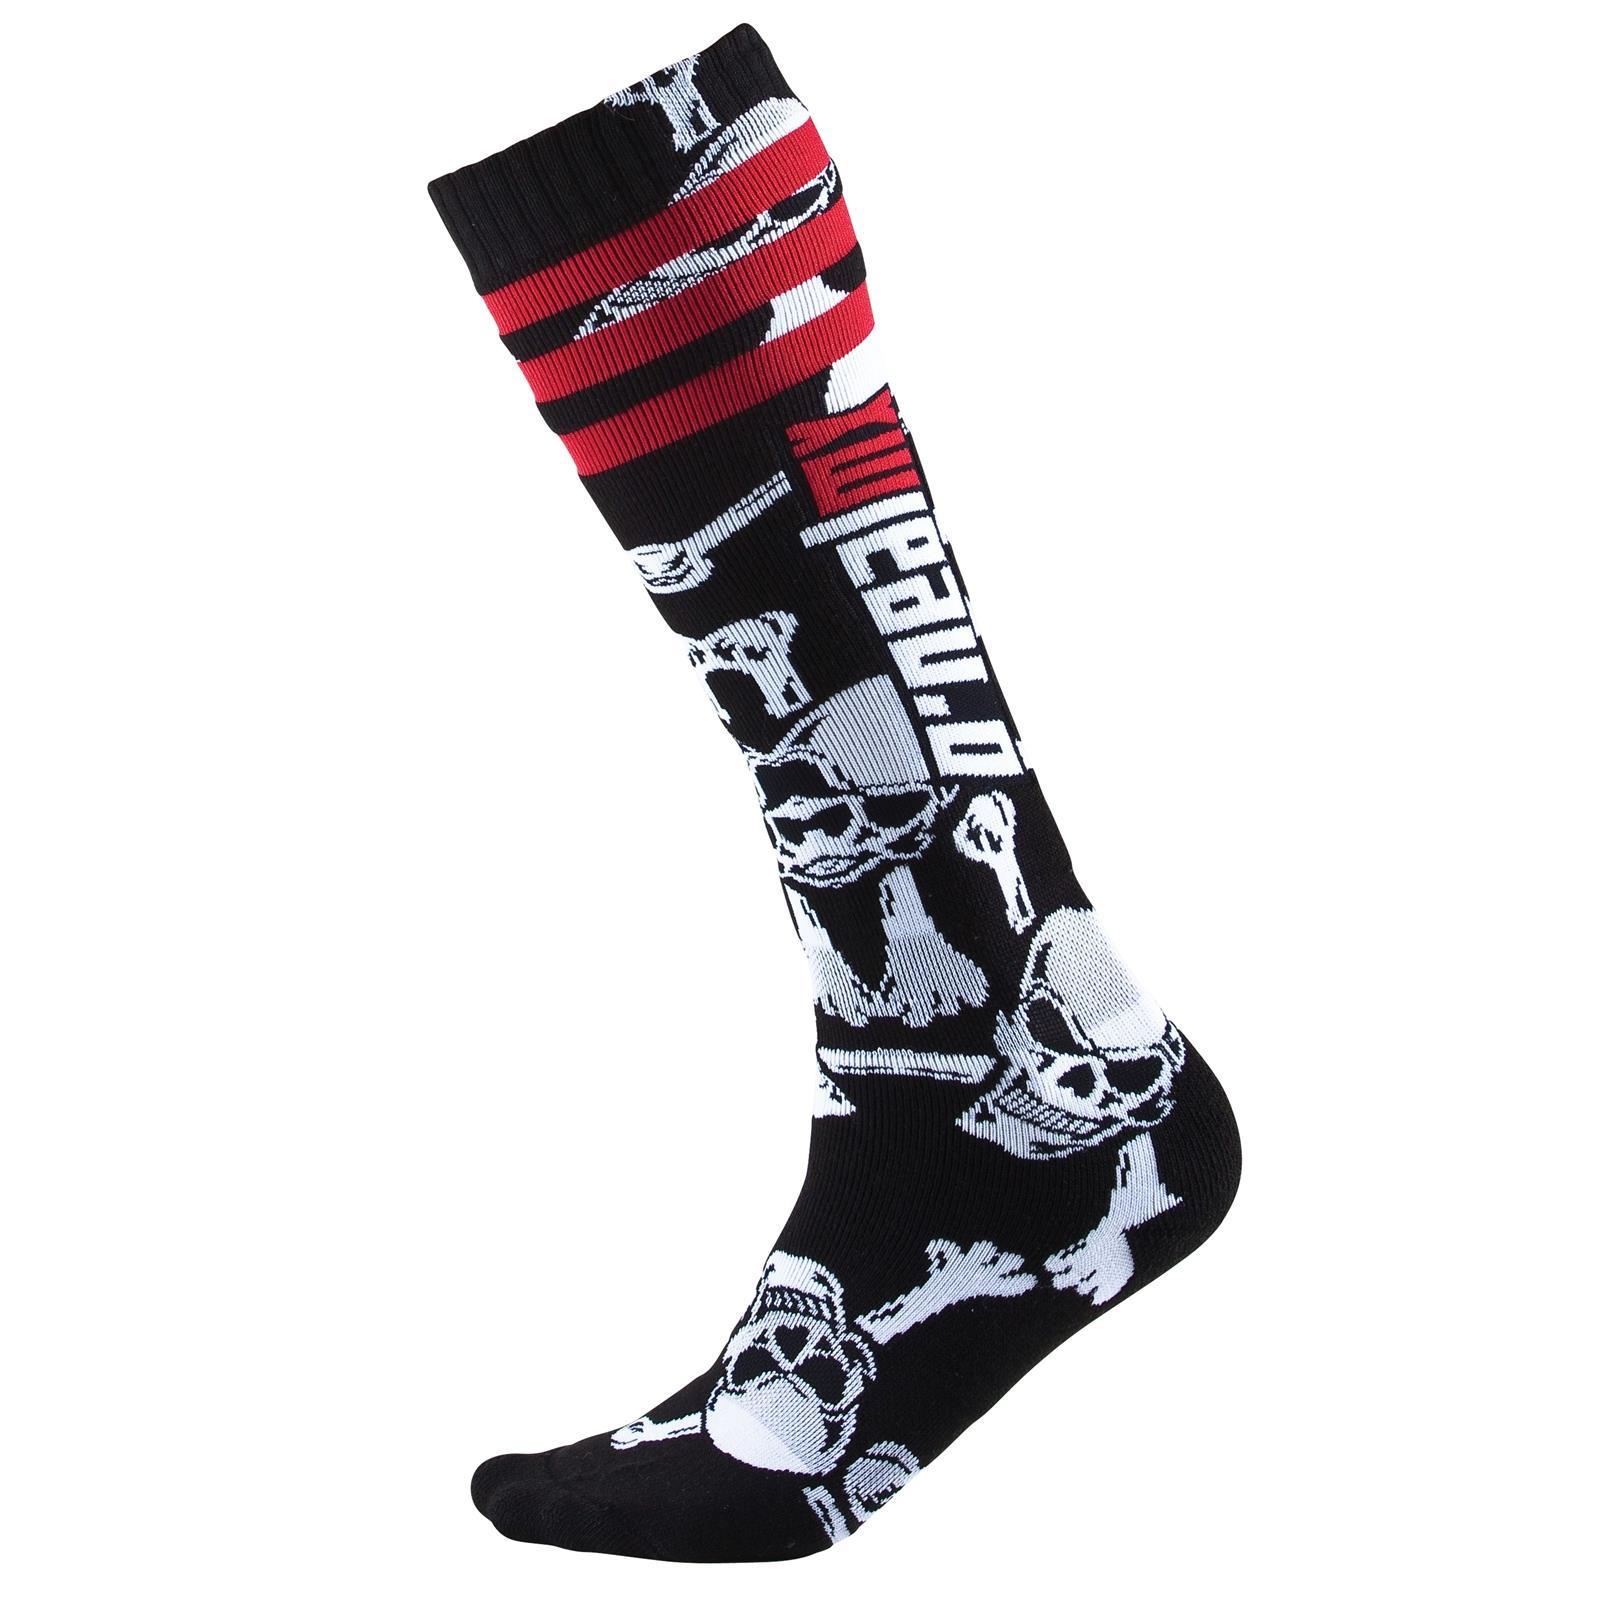 ONEAL-MOTO-CROSS-Calze-Moto-Enduro-MX-MTB-ATV-Quad-Calze-Sock-BICICLETTA-FR miniatura 31